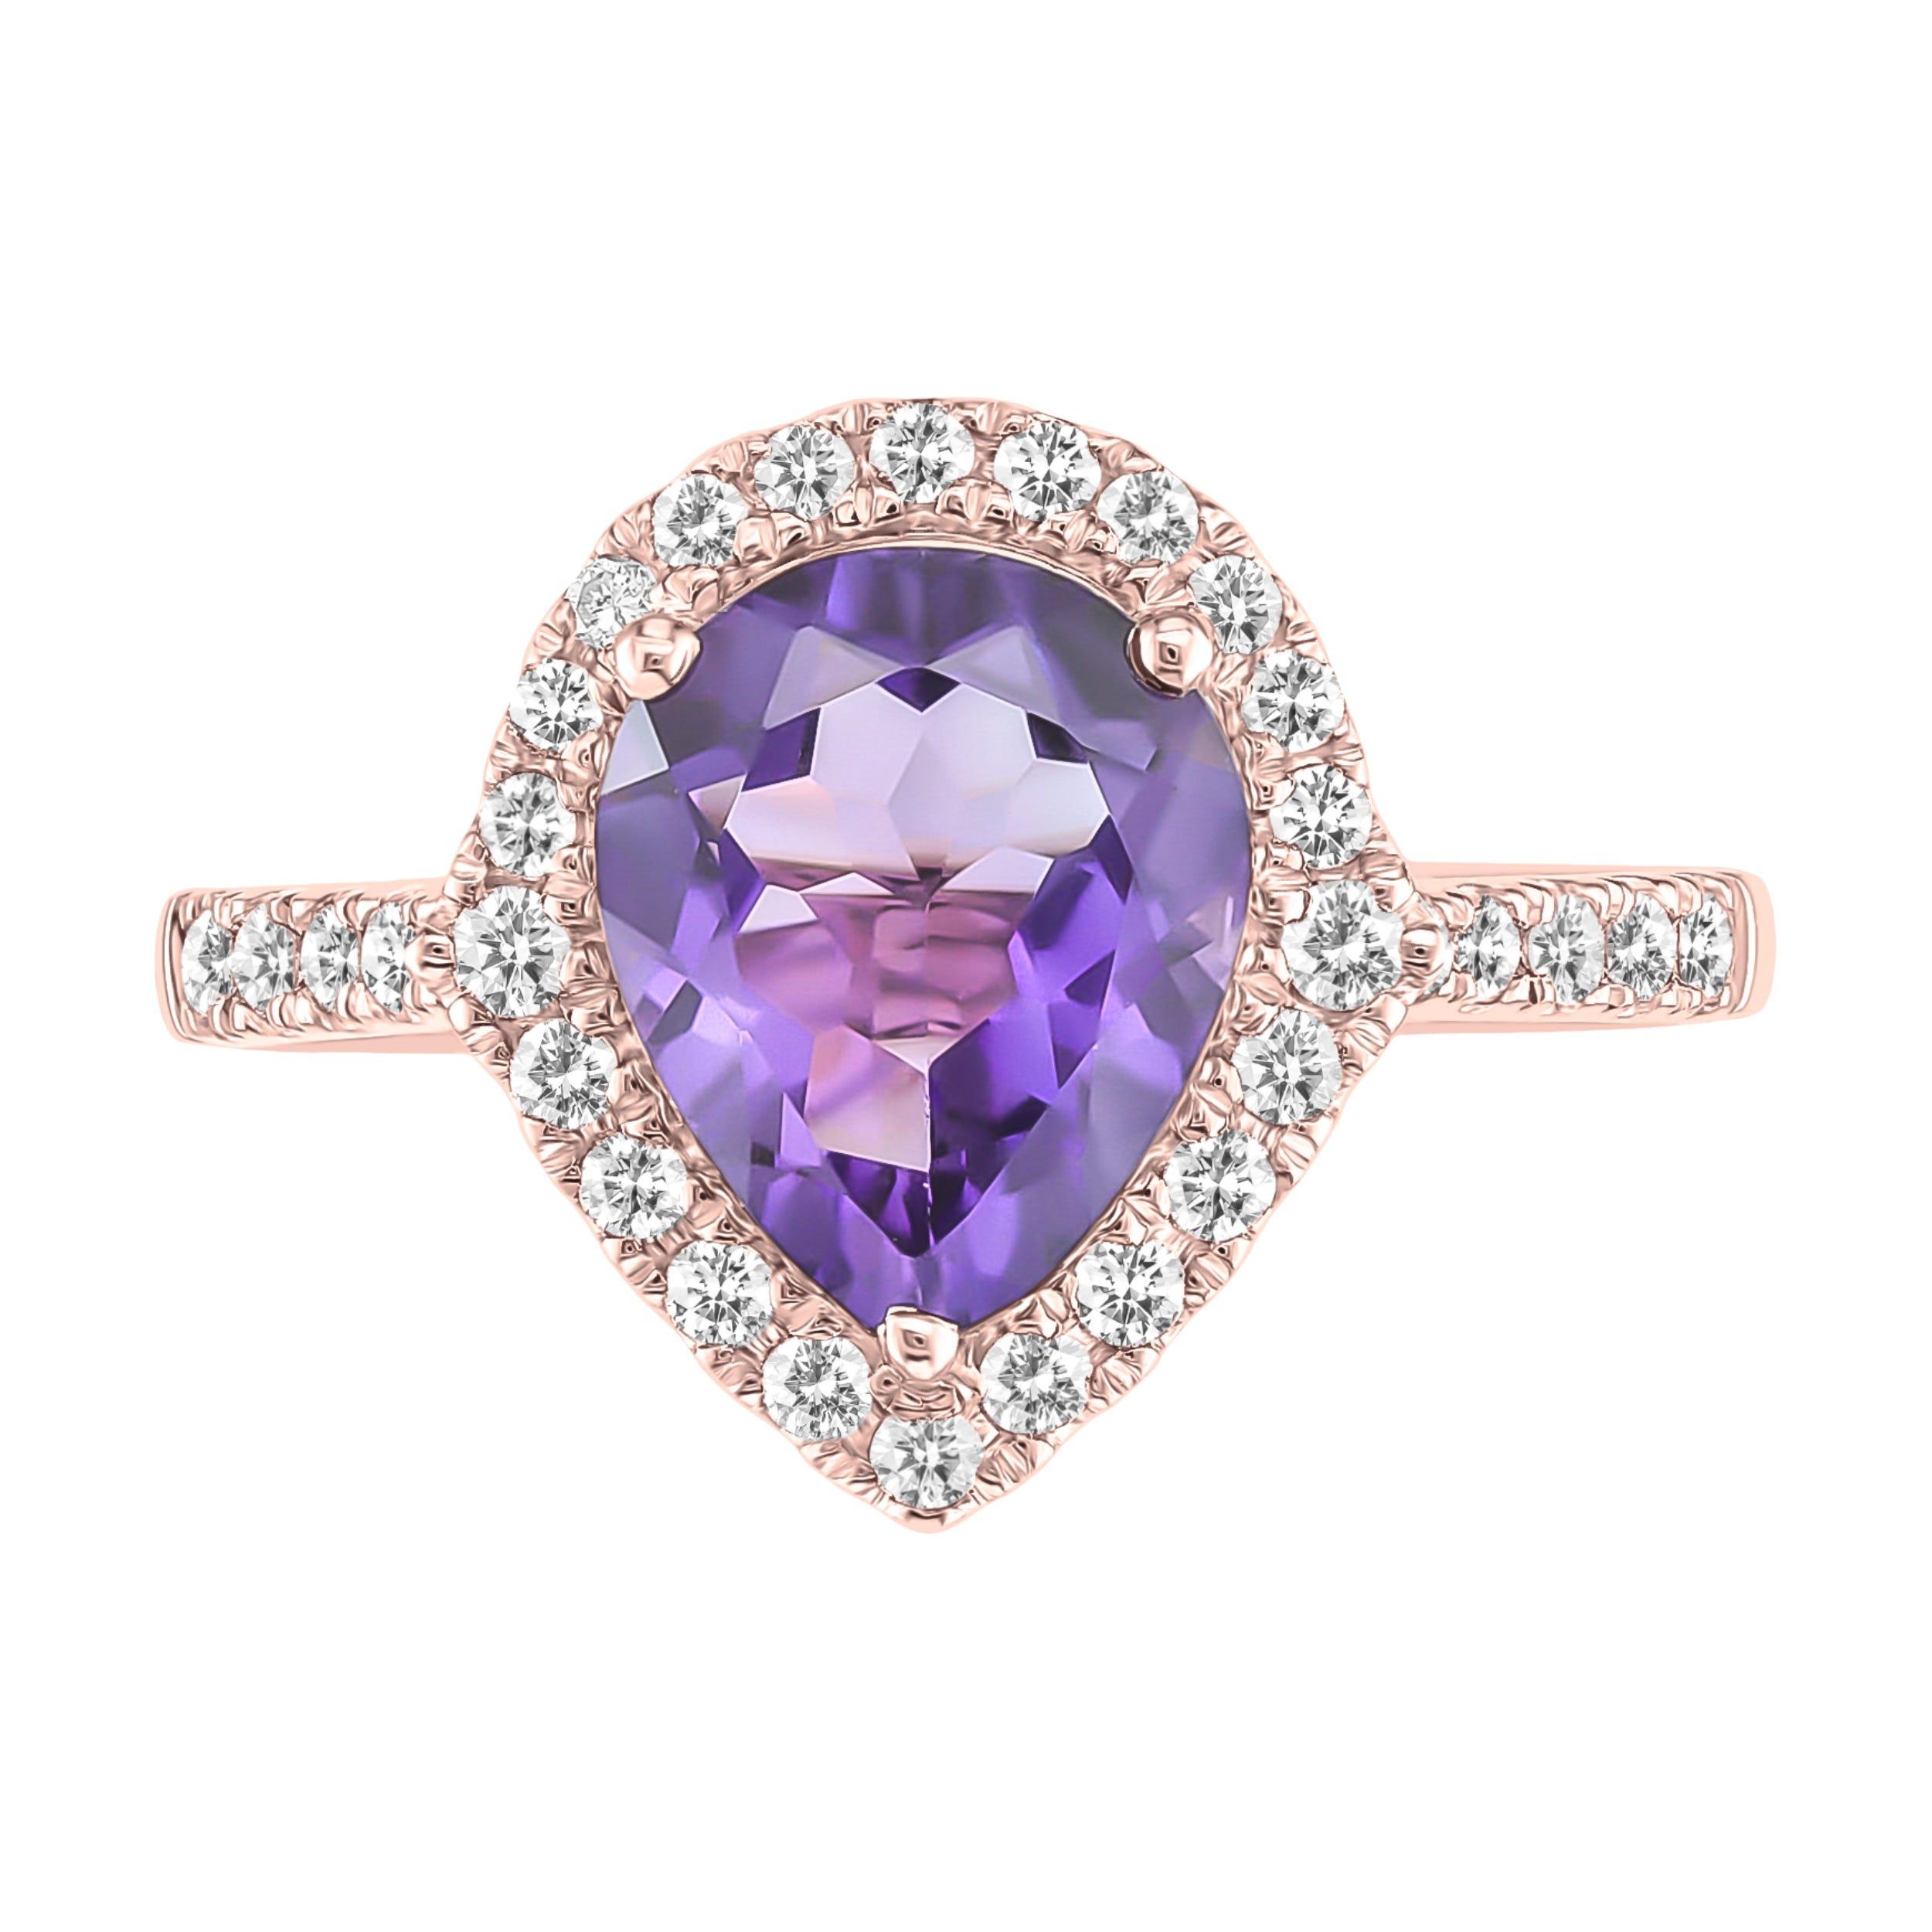 Amethyst & Diamond Pear Ring in 10k Rose Gold